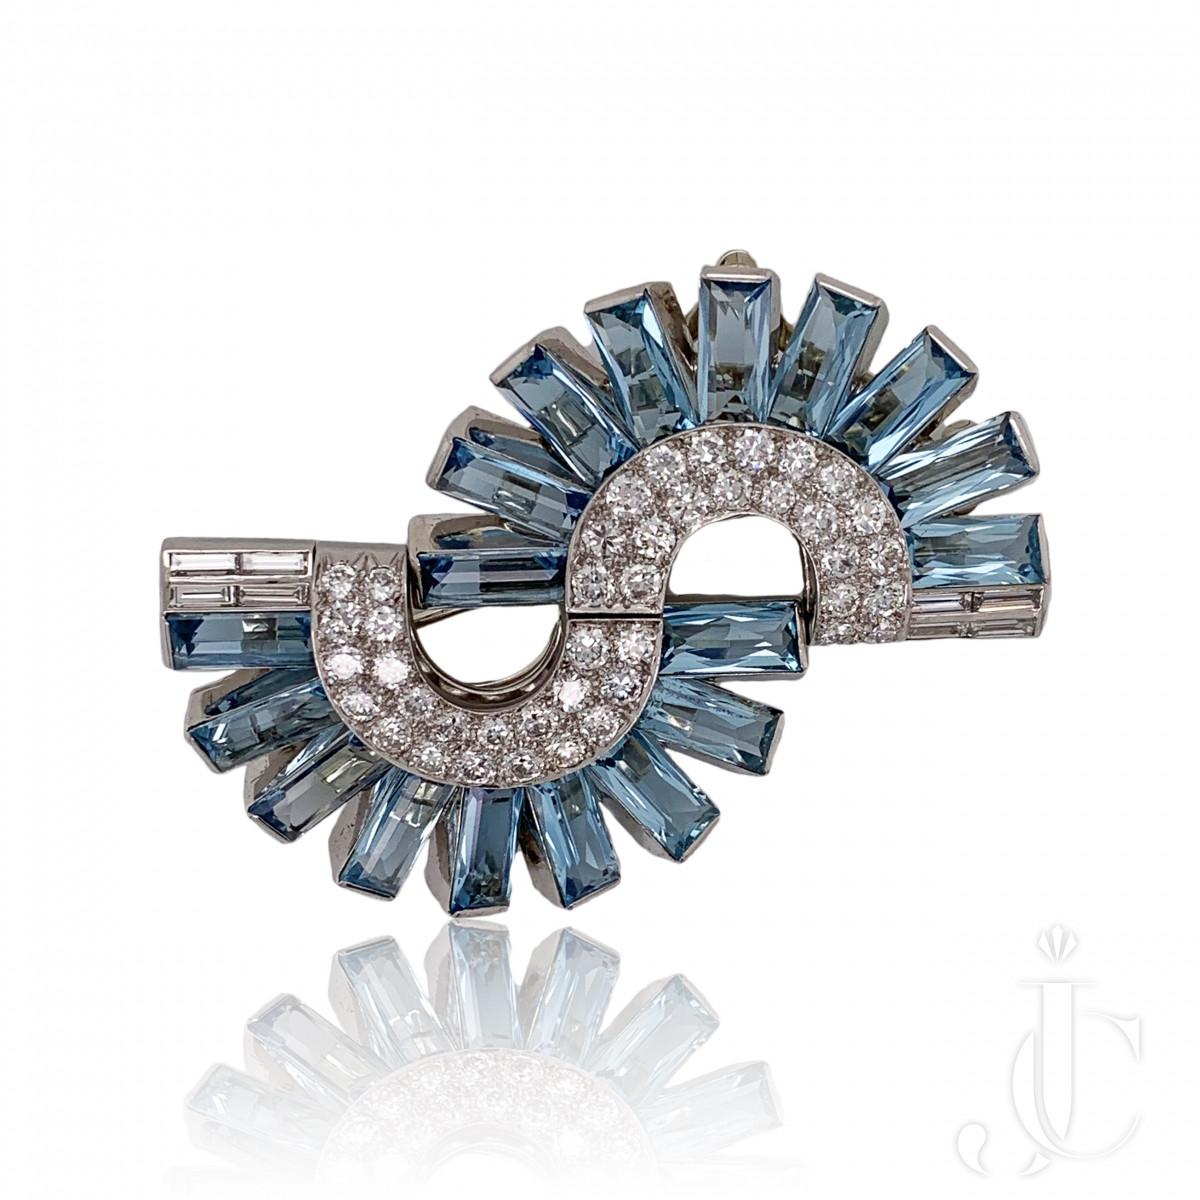 DECO AQUA DIAMOND DOUBLE CLIPS